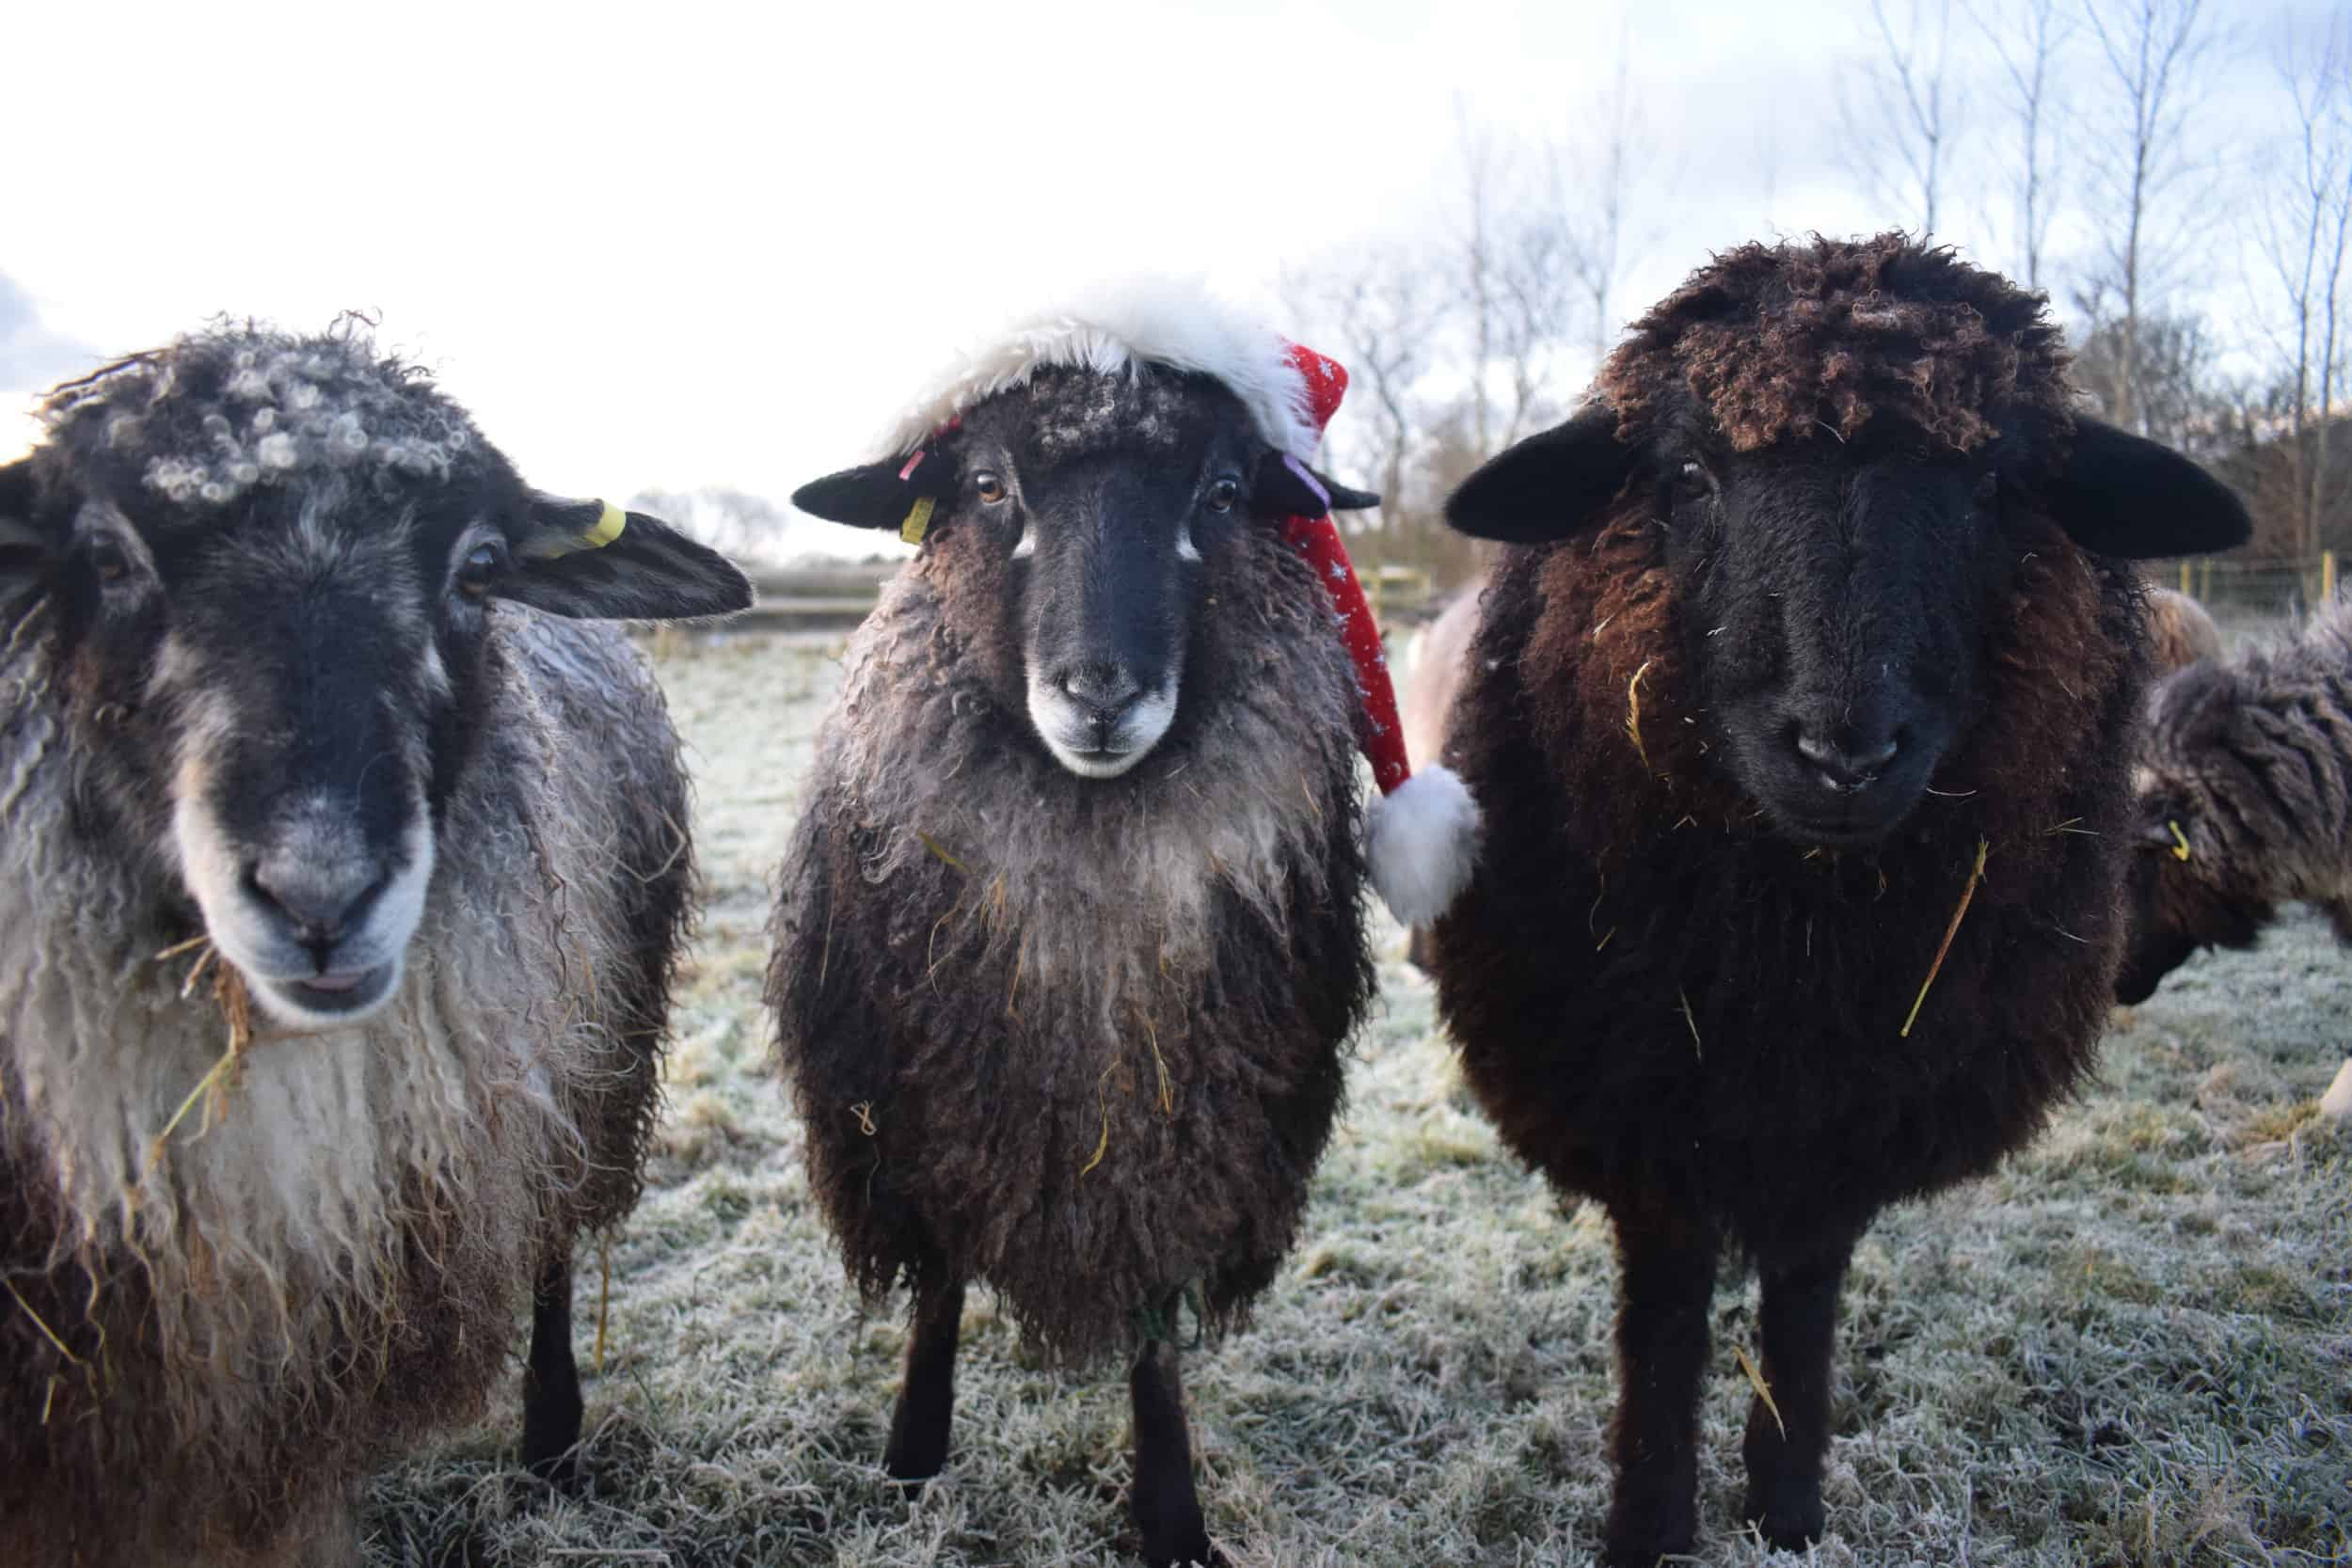 florence jemima spot christmas sheep xmas santa hat coloured leicester longwool gotland shetland sheep crossbreed english blue kind fibre